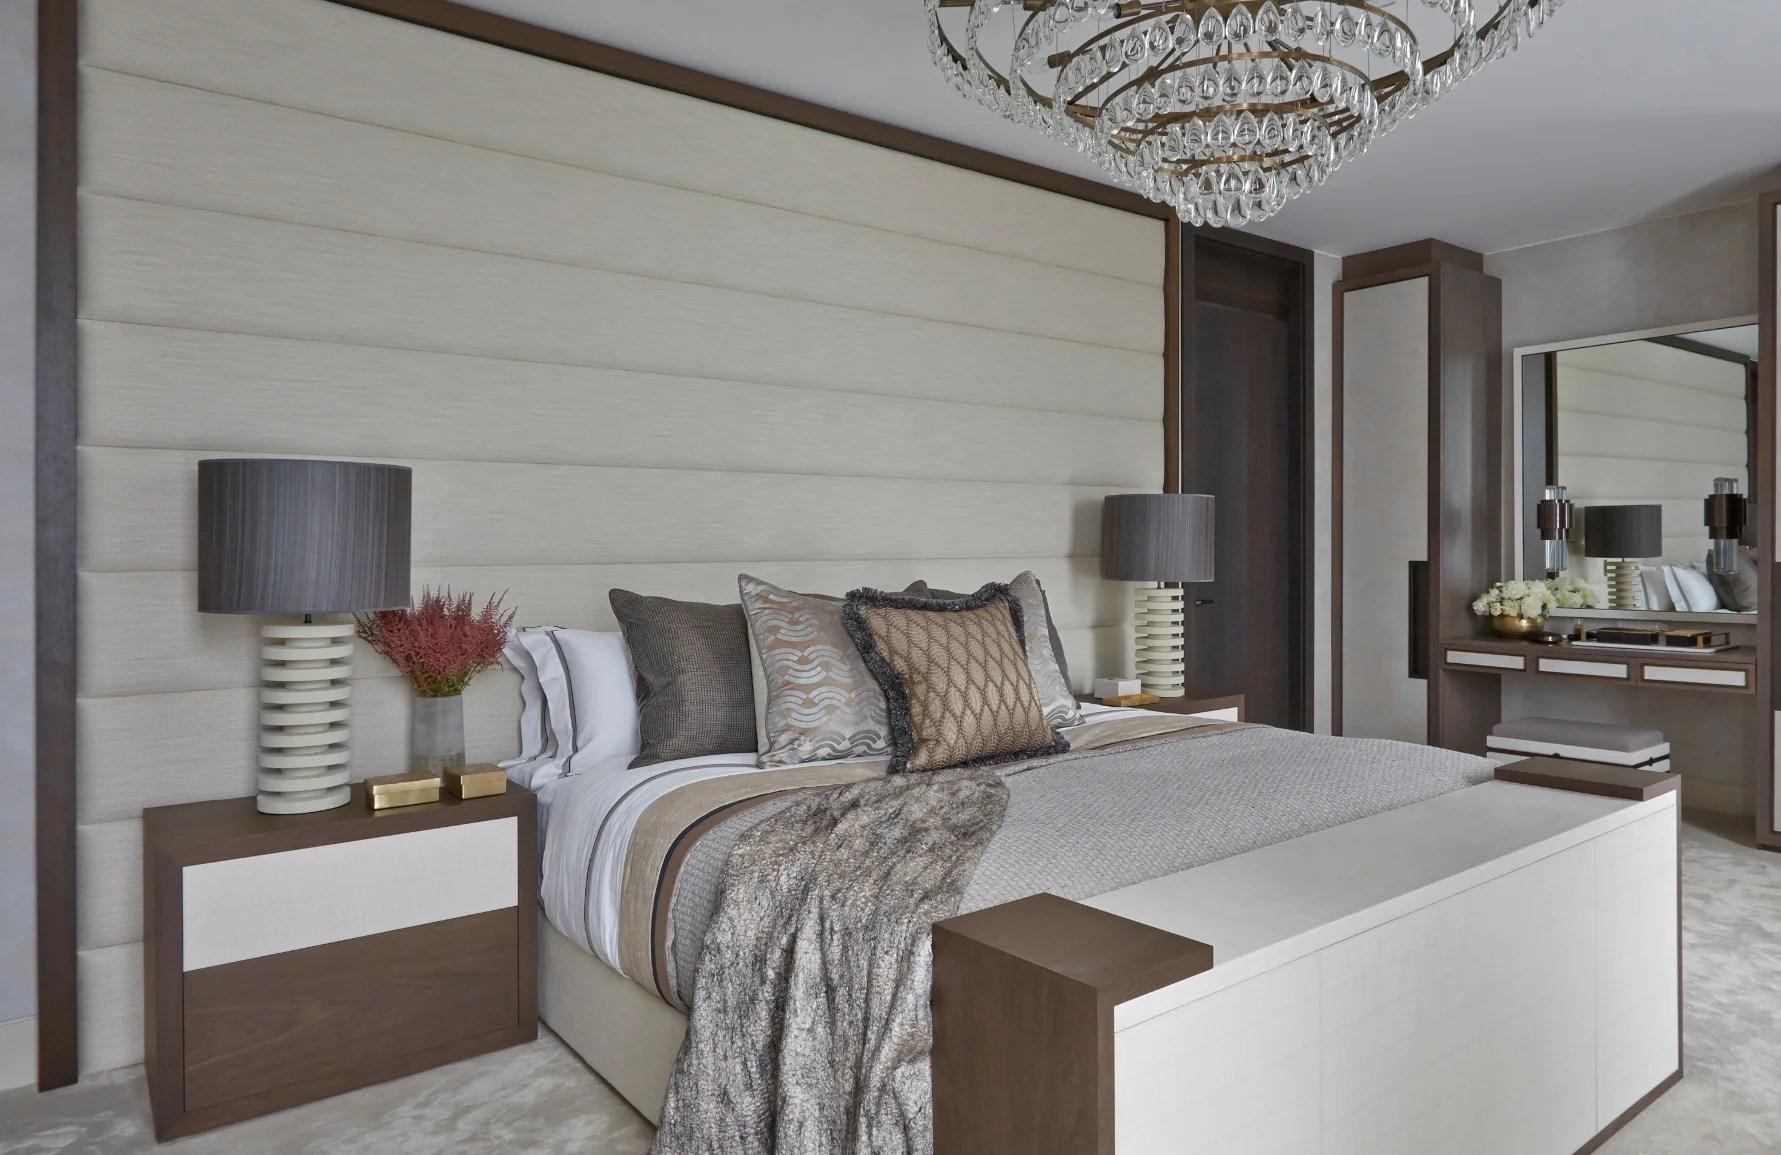 Master Bedroom Ideas | Small & Large Bedroom Tips | LuxDeco on Master Bedroom Ideas  id=73887